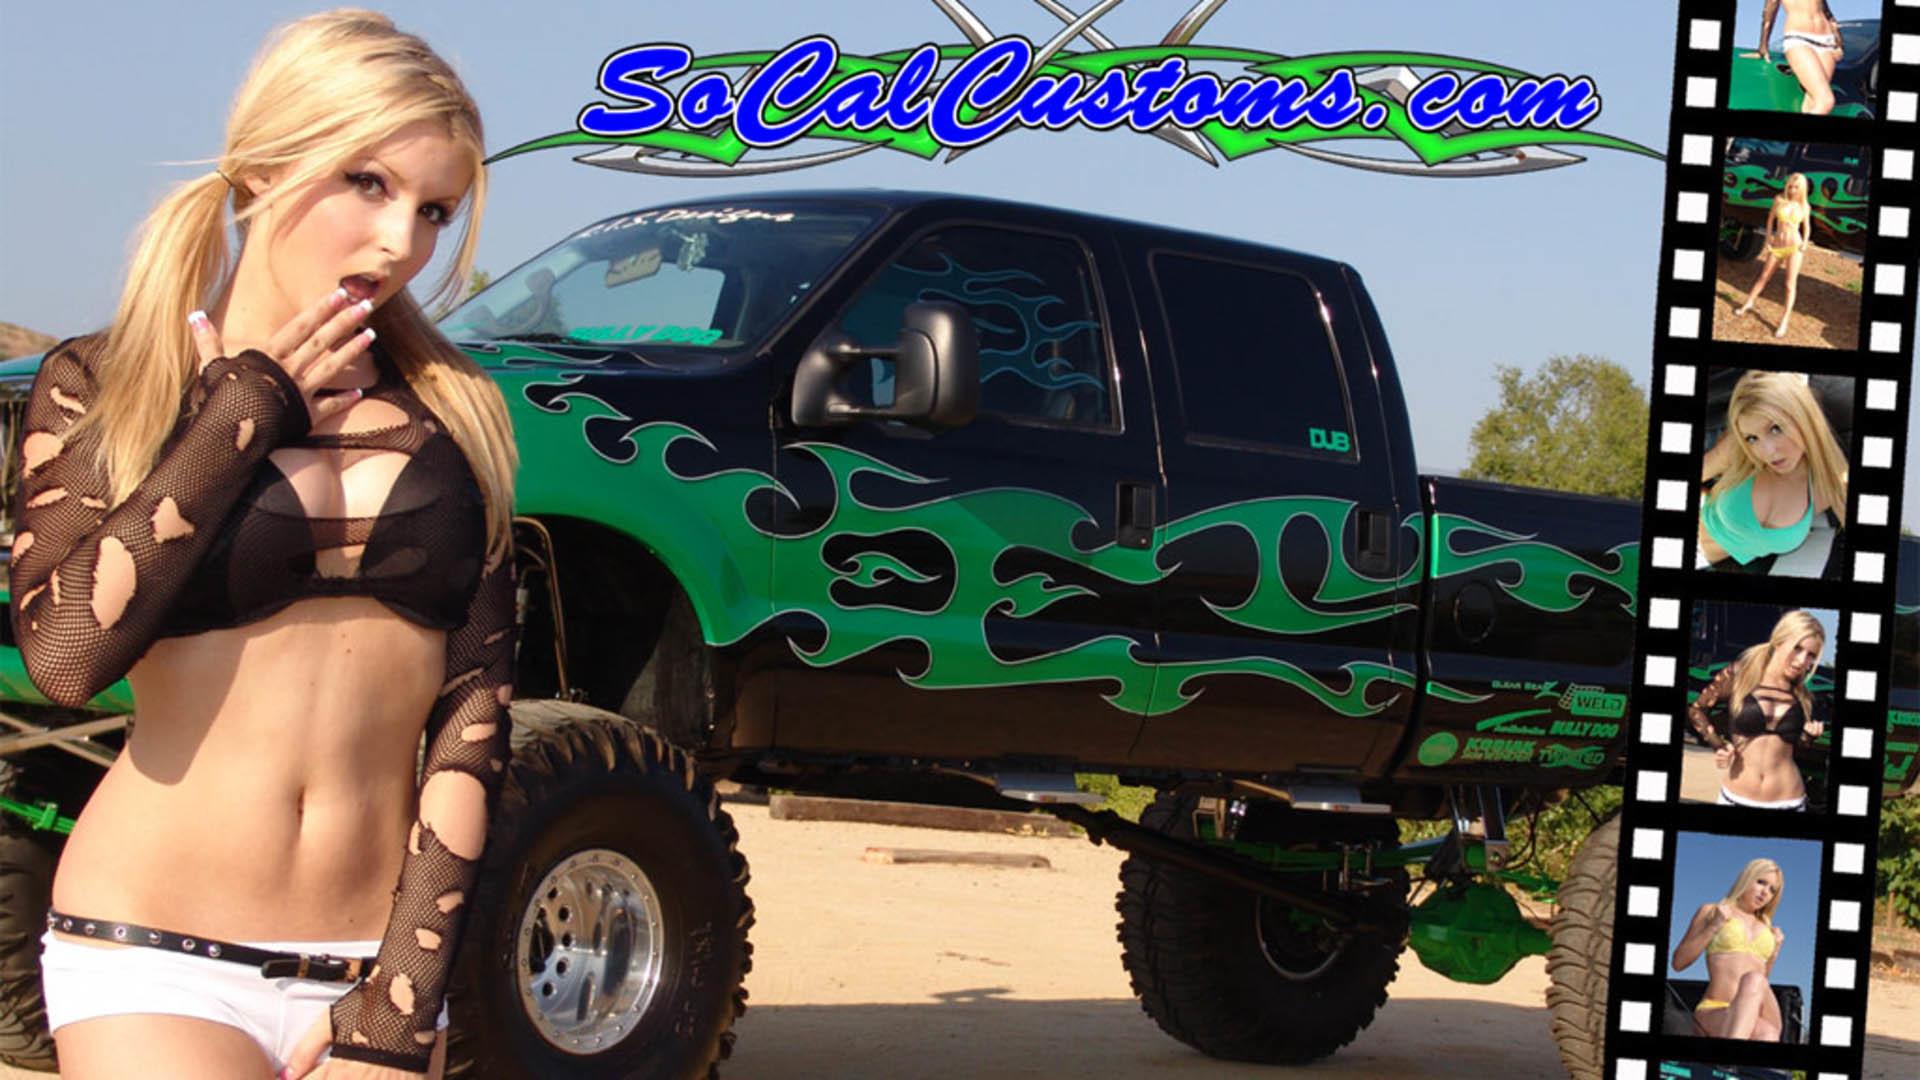 1920x1200 Shantal women females blondes lowrider custom classic truck wallpaper .